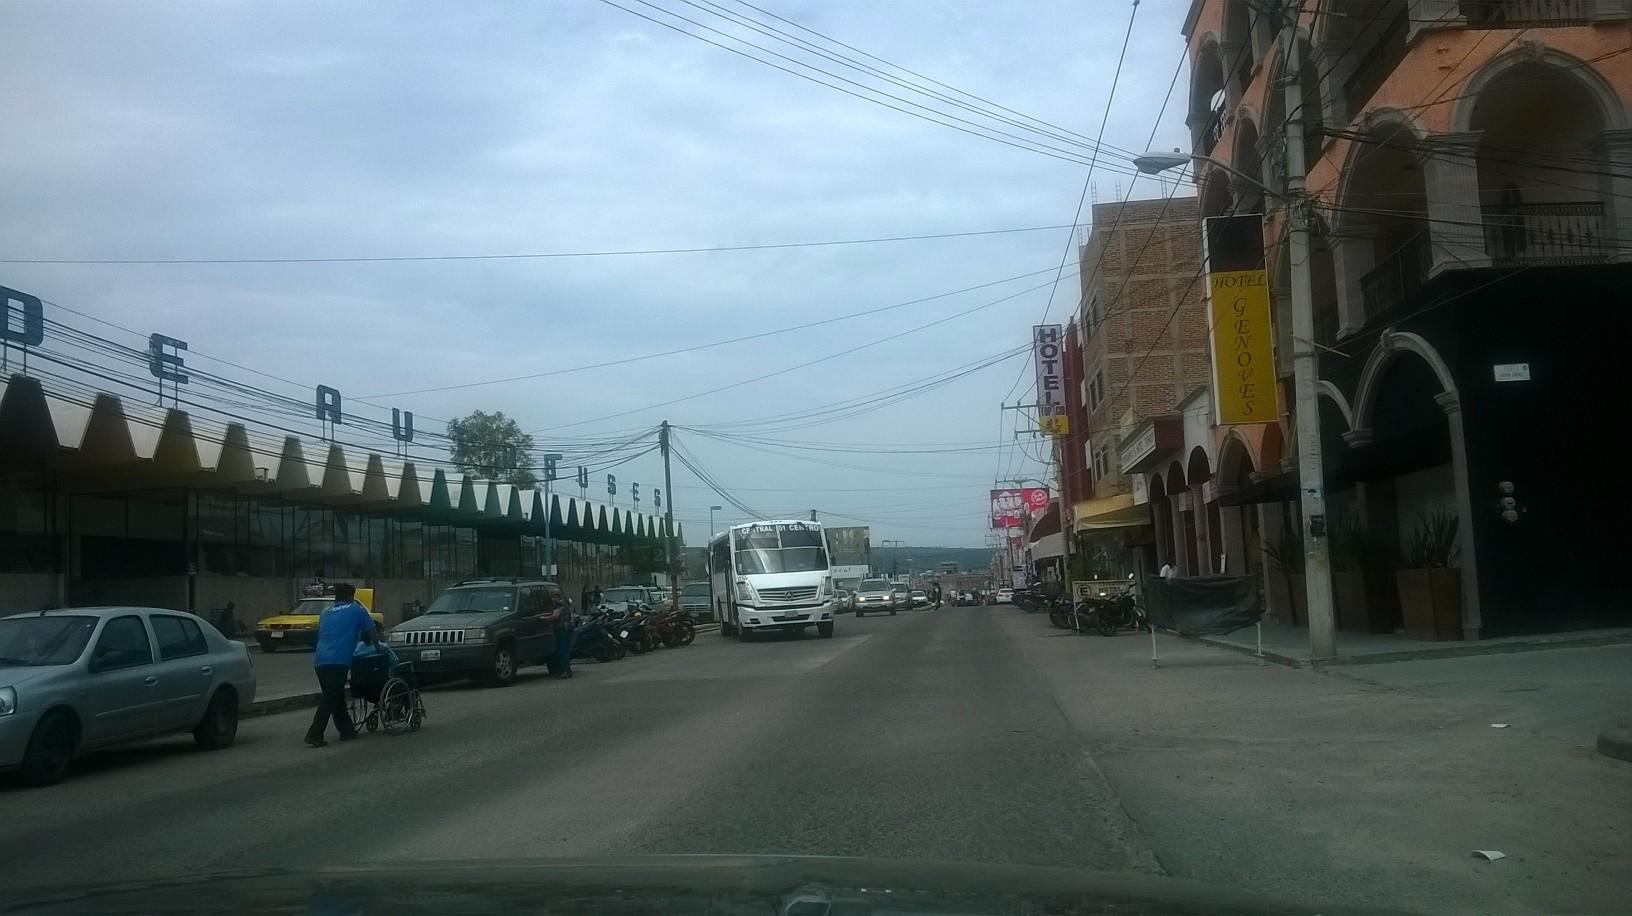 tepatitlan de morelos city center bus depot apr15